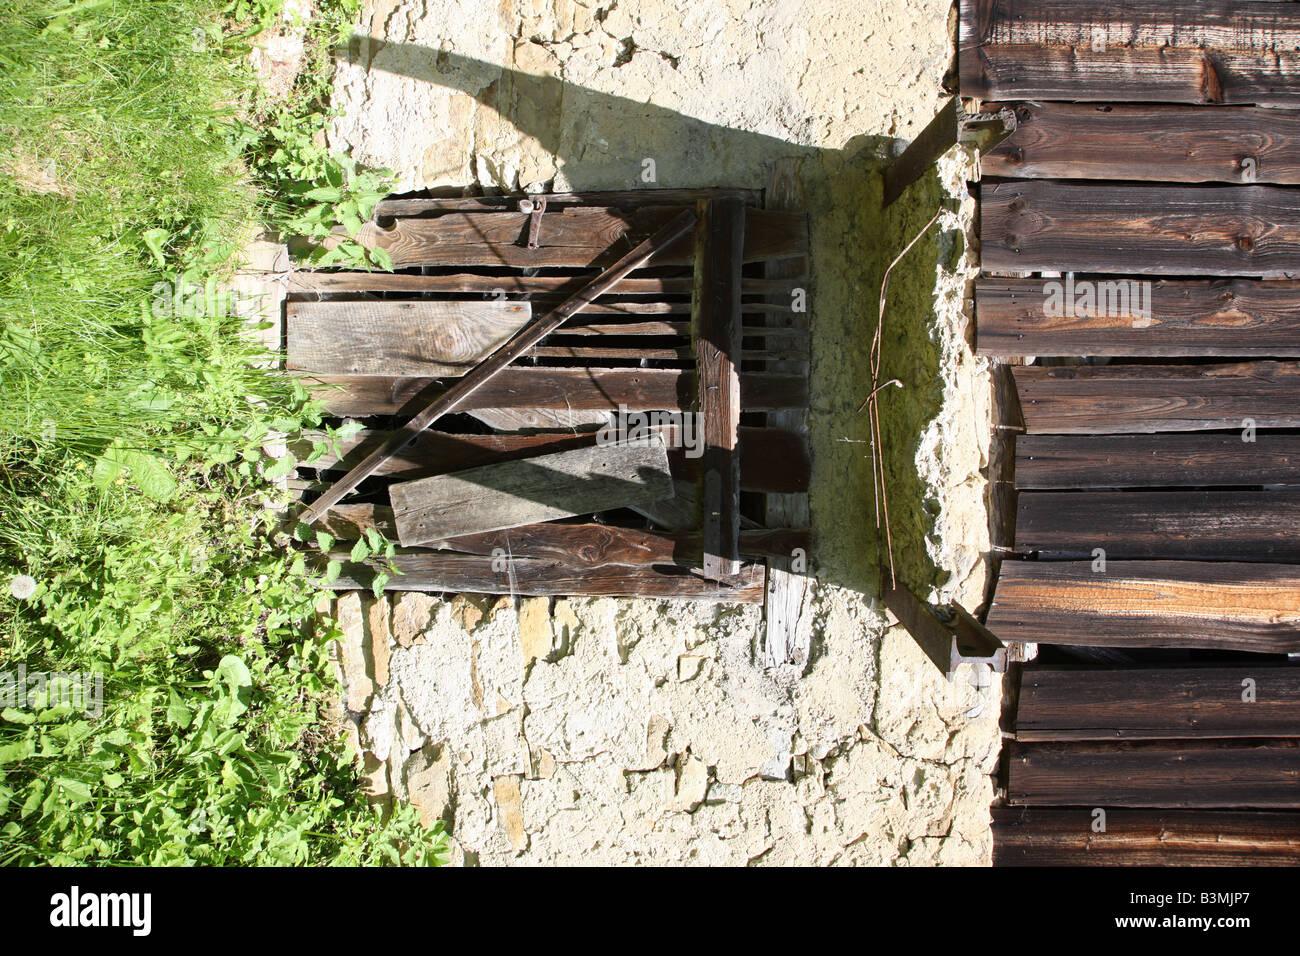 Dilapidated barn basement - Stock Image